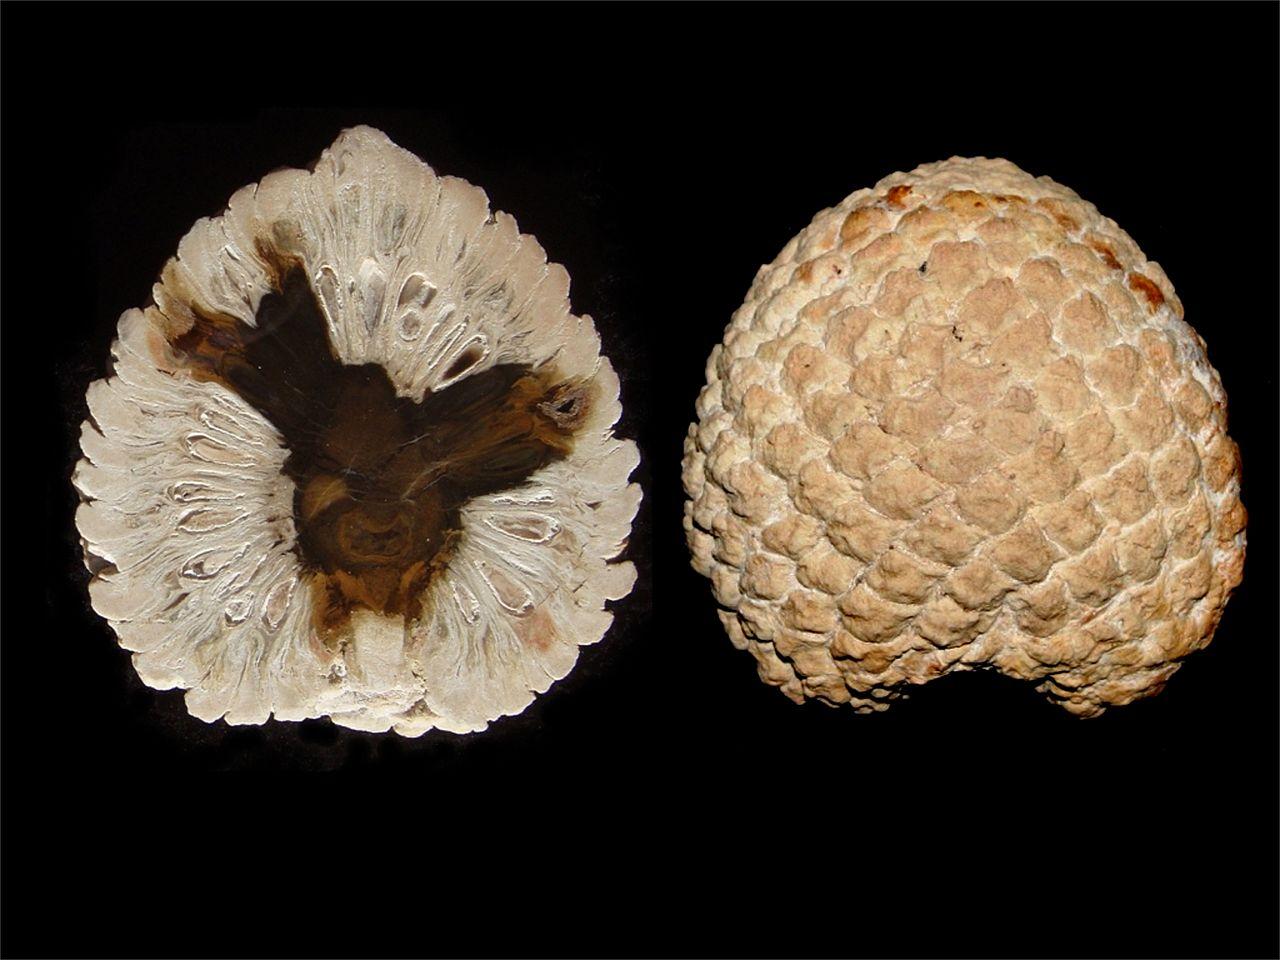 4. araucaria mirabilies cones